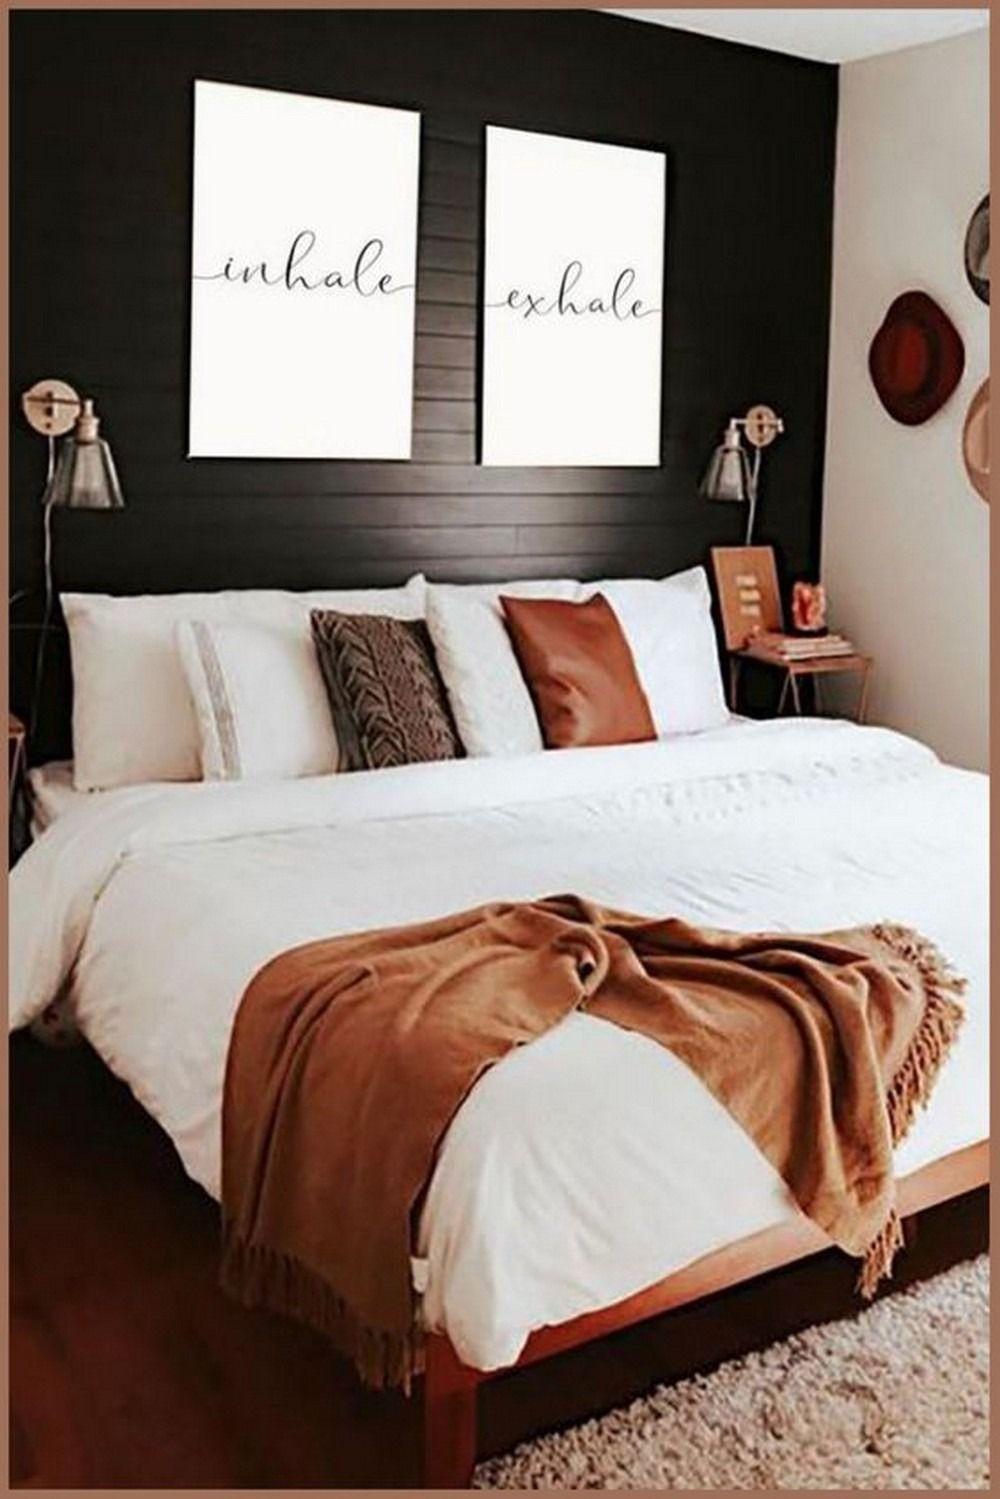 12 Borderline Genius Ways To Spruce Up Your Bedroom Decor Ideas For Couples In 2021 Black Accent Walls Bedroom Couple Bedroom